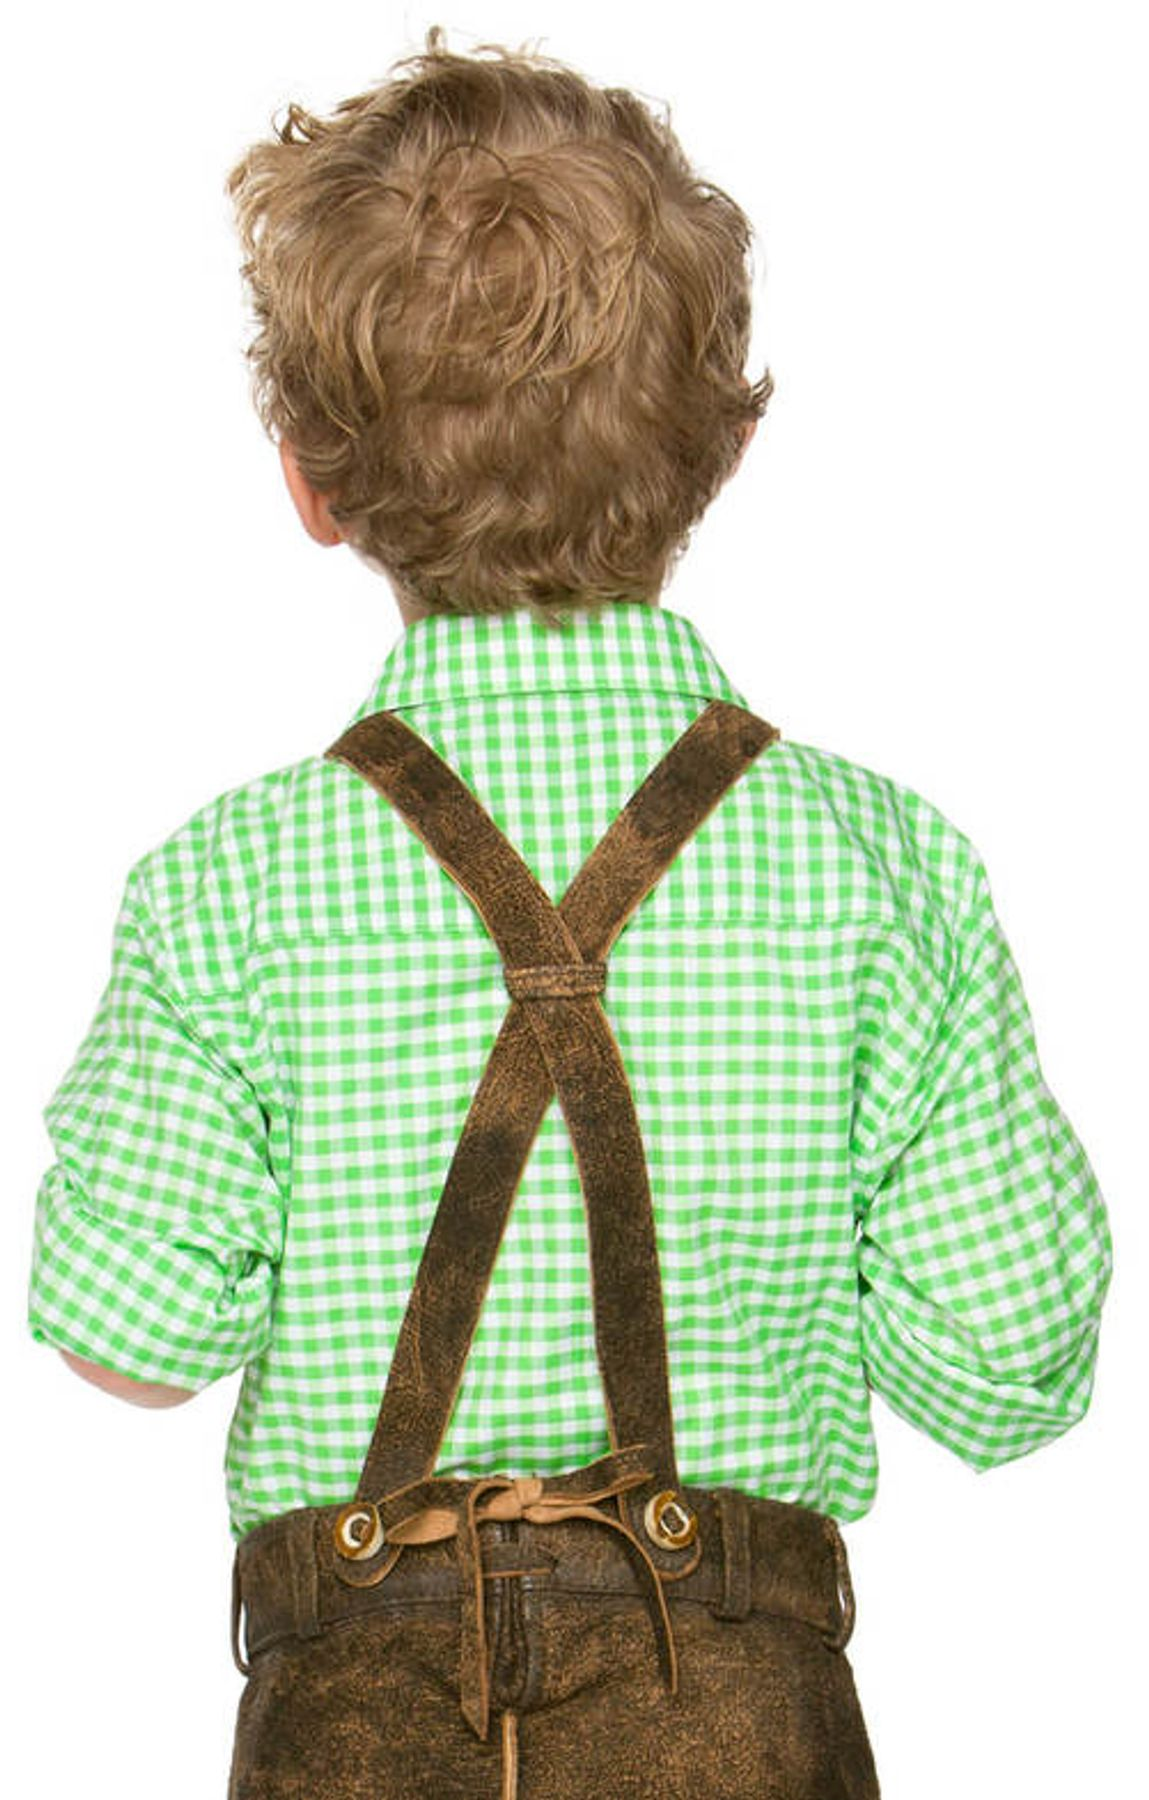 Stockerpoint - Kinder Trachten Hemd Leo, Gr. 86-116 – Bild 3